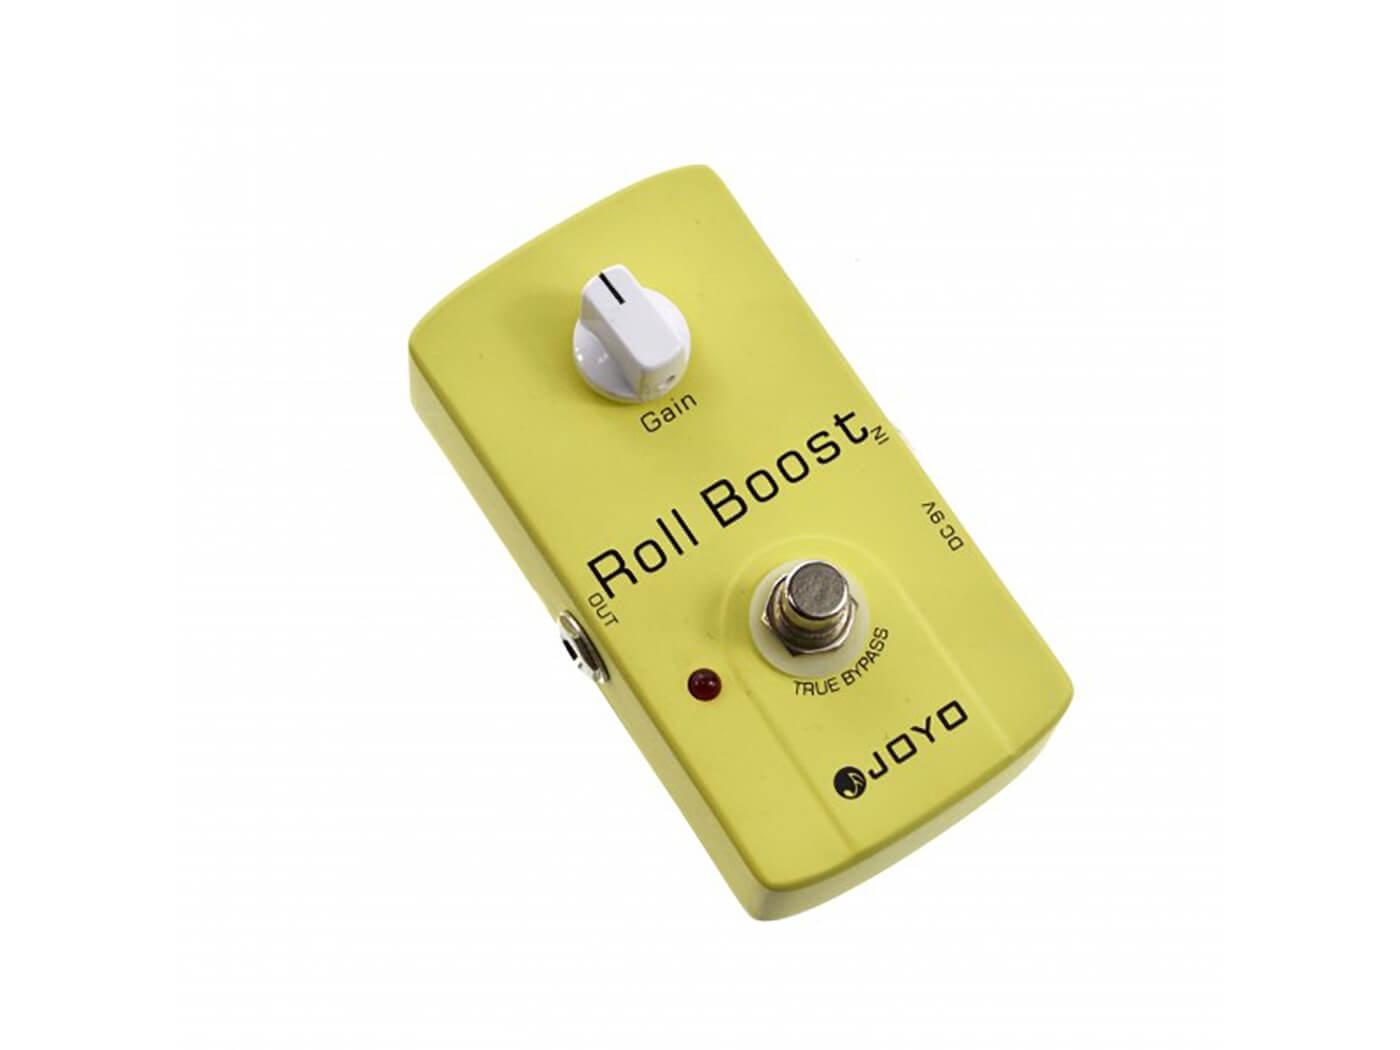 Joyo Audio Roll Boost